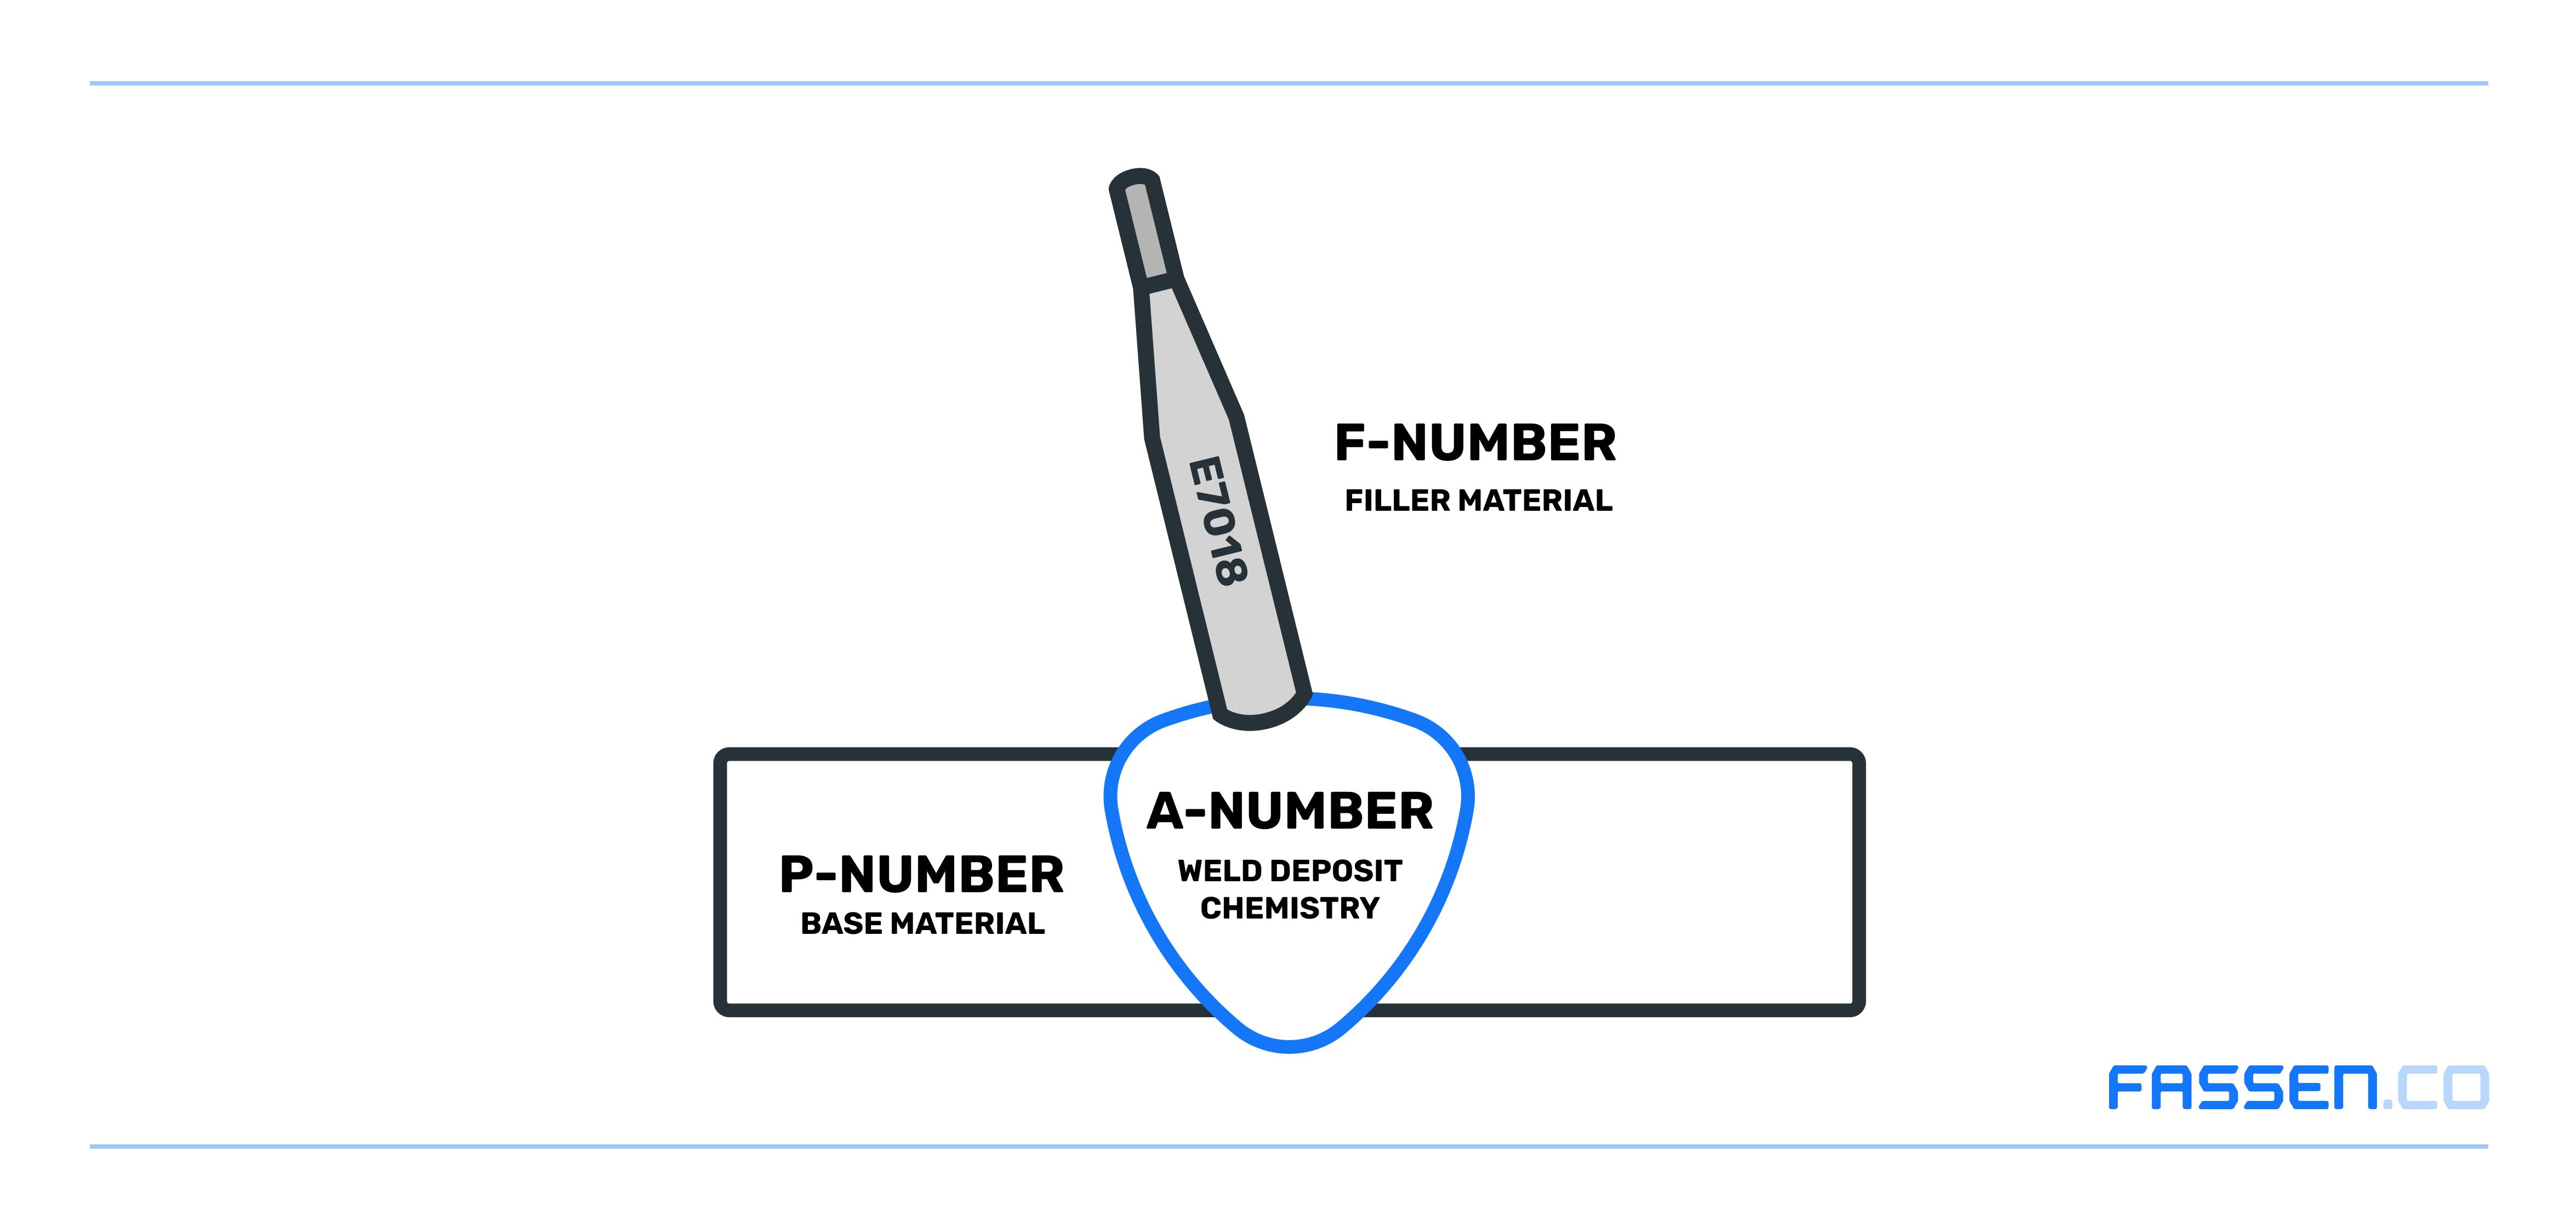 A-Number P-Number F-Number